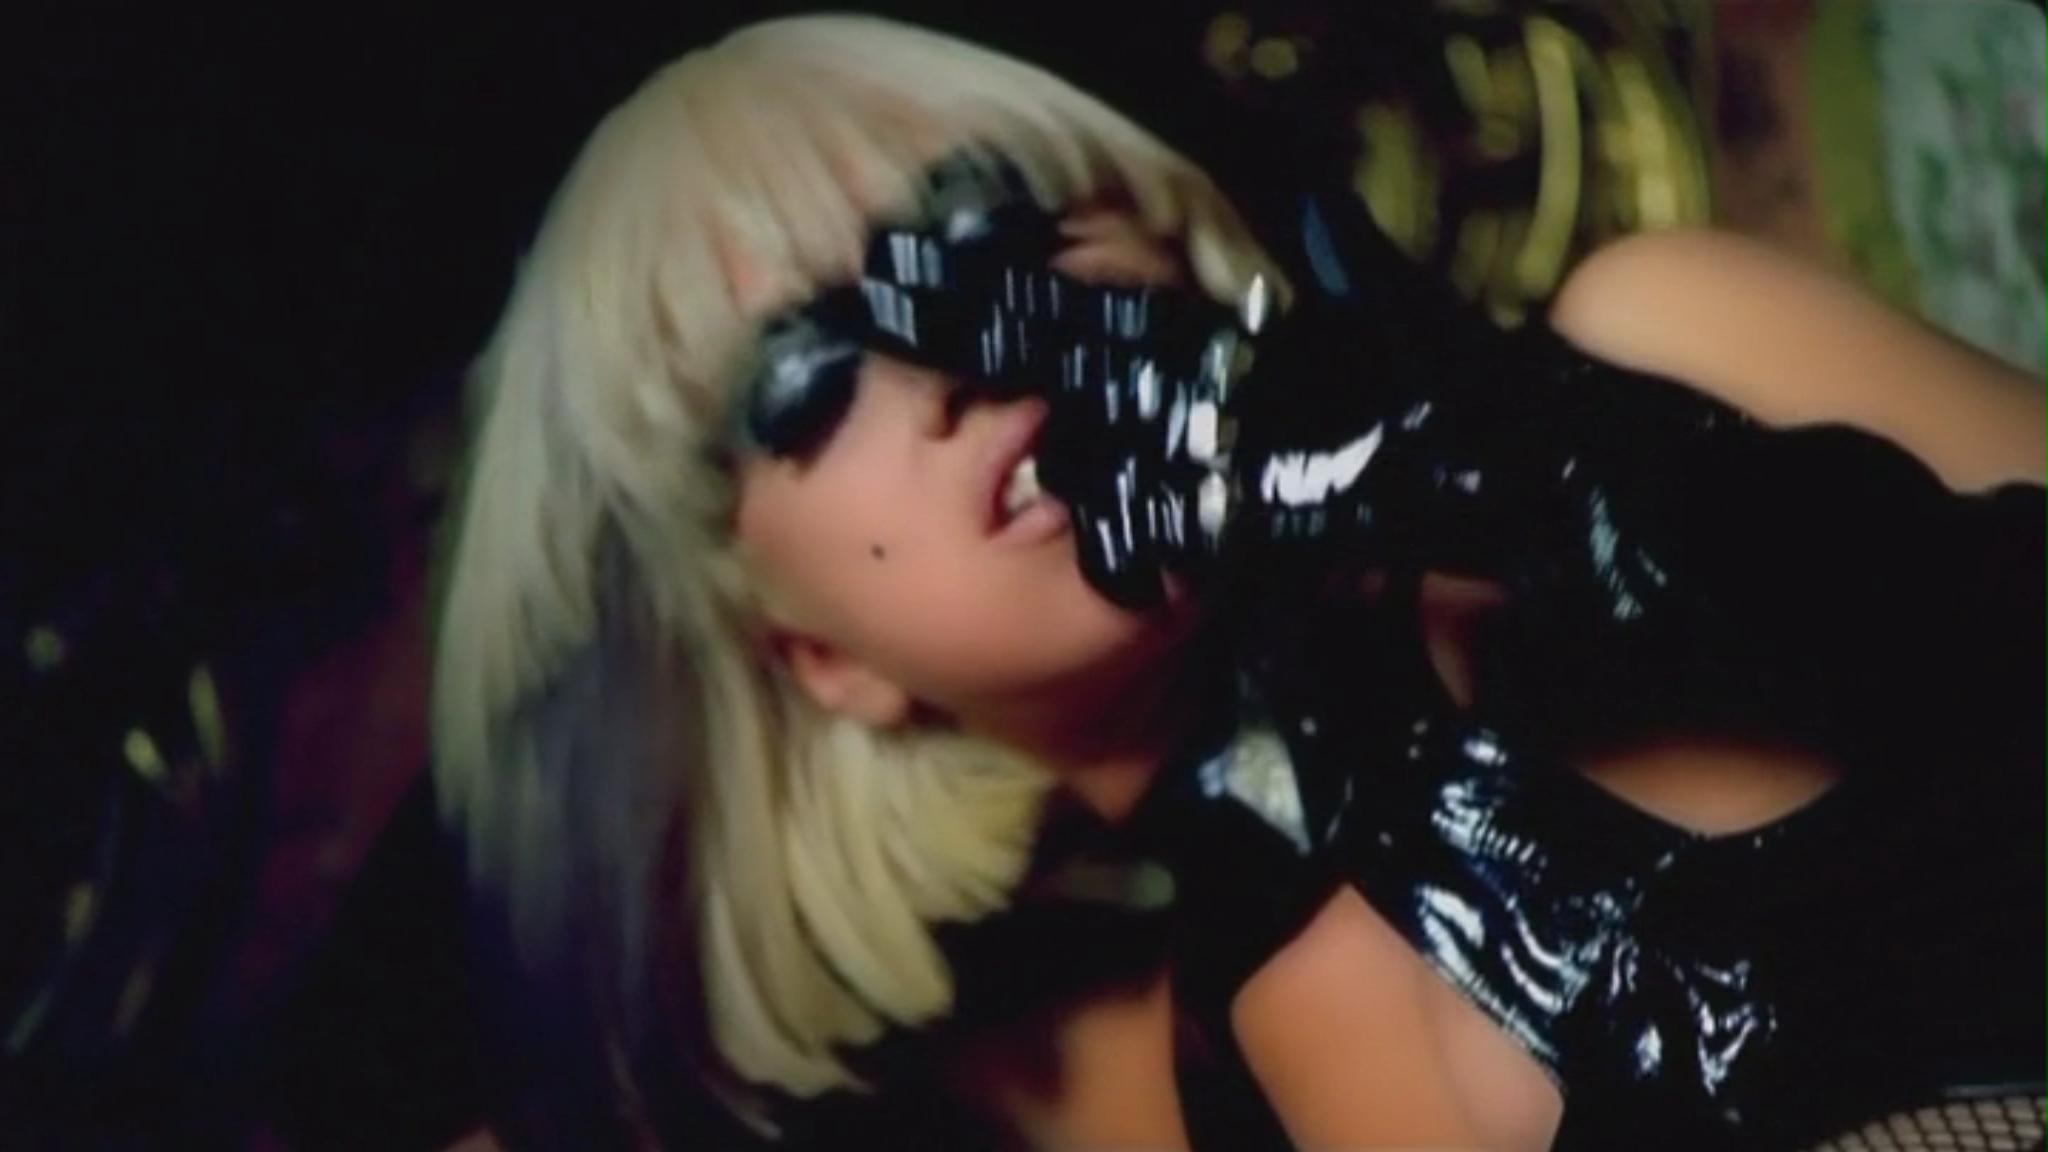 Lady Gaga - Paparazzi Music Video - Screencaps - Lady Gaga ... Lady Gaga Songs